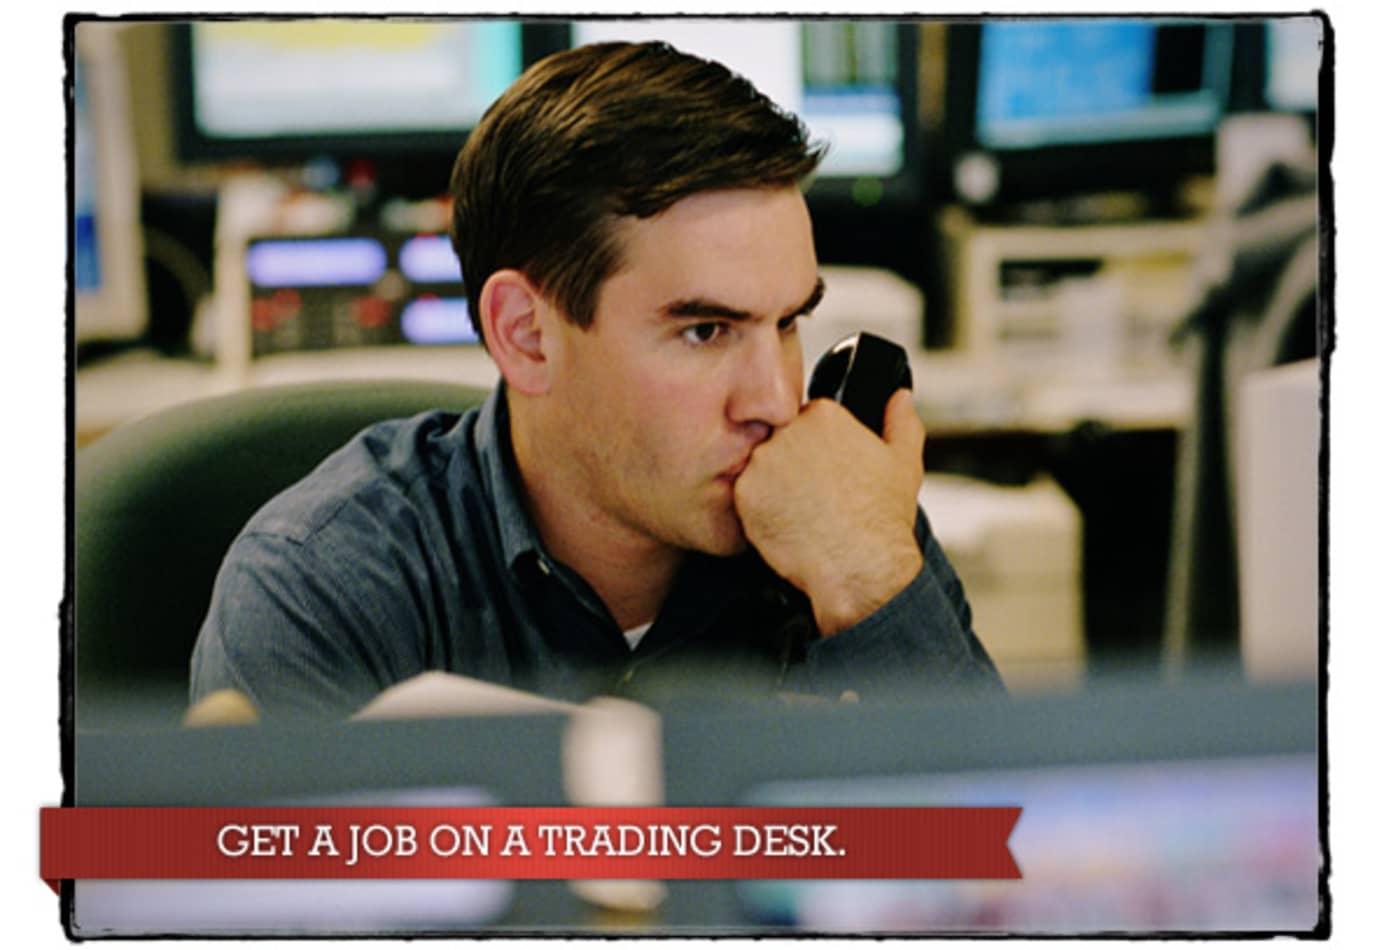 CNBC_rogue_trading_1desk_v2.jpg